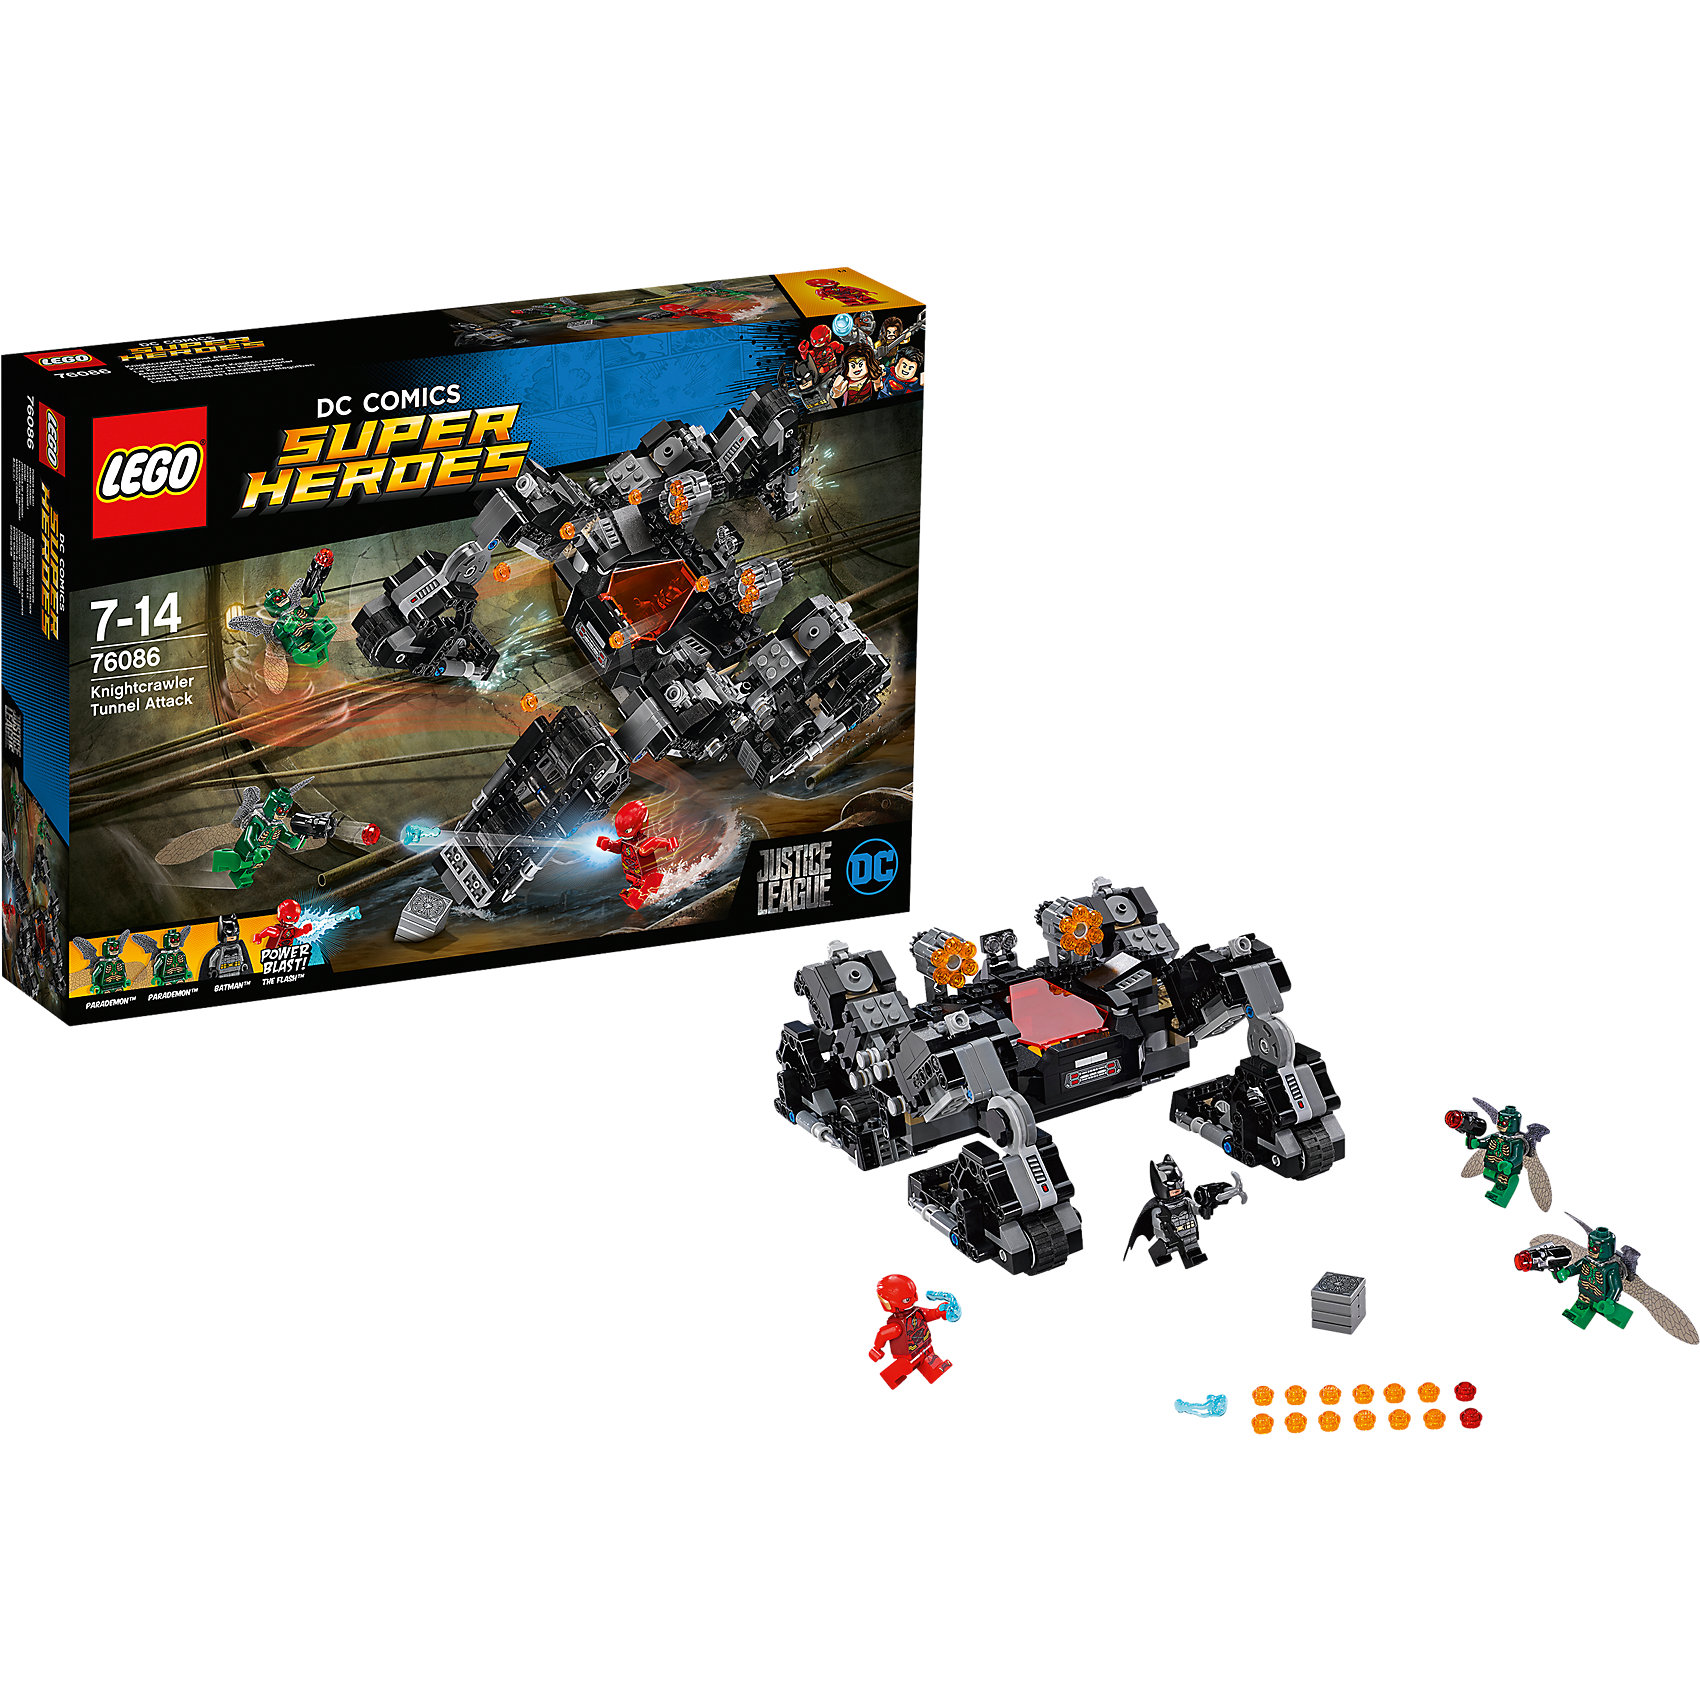 LEGO Super Heroes 76086: Сражение в туннелеПластмассовые конструкторы<br><br><br>Ширина мм: 384<br>Глубина мм: 263<br>Высота мм: 76<br>Вес г: 788<br>Возраст от месяцев: 84<br>Возраст до месяцев: 168<br>Пол: Мужской<br>Возраст: Детский<br>SKU: 5620015